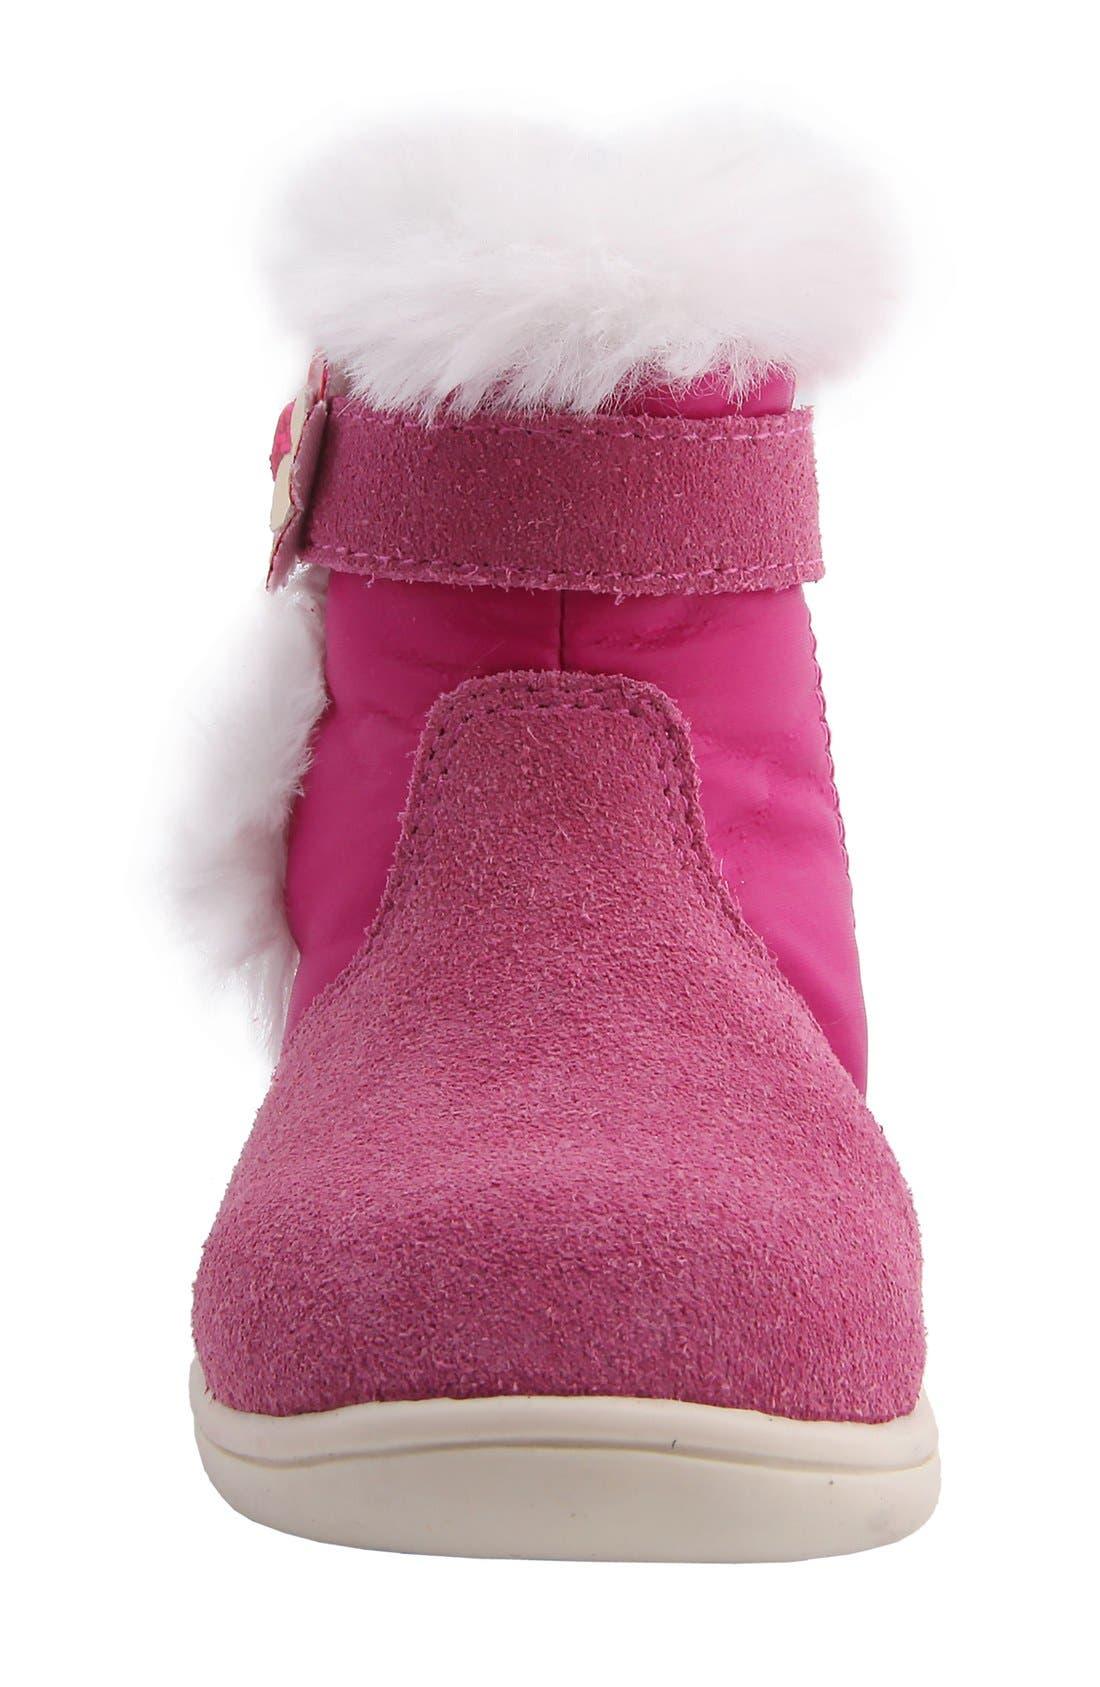 Nina 'Anya' Faux Fur Bootie,                             Alternate thumbnail 2, color,                             Pink Suede